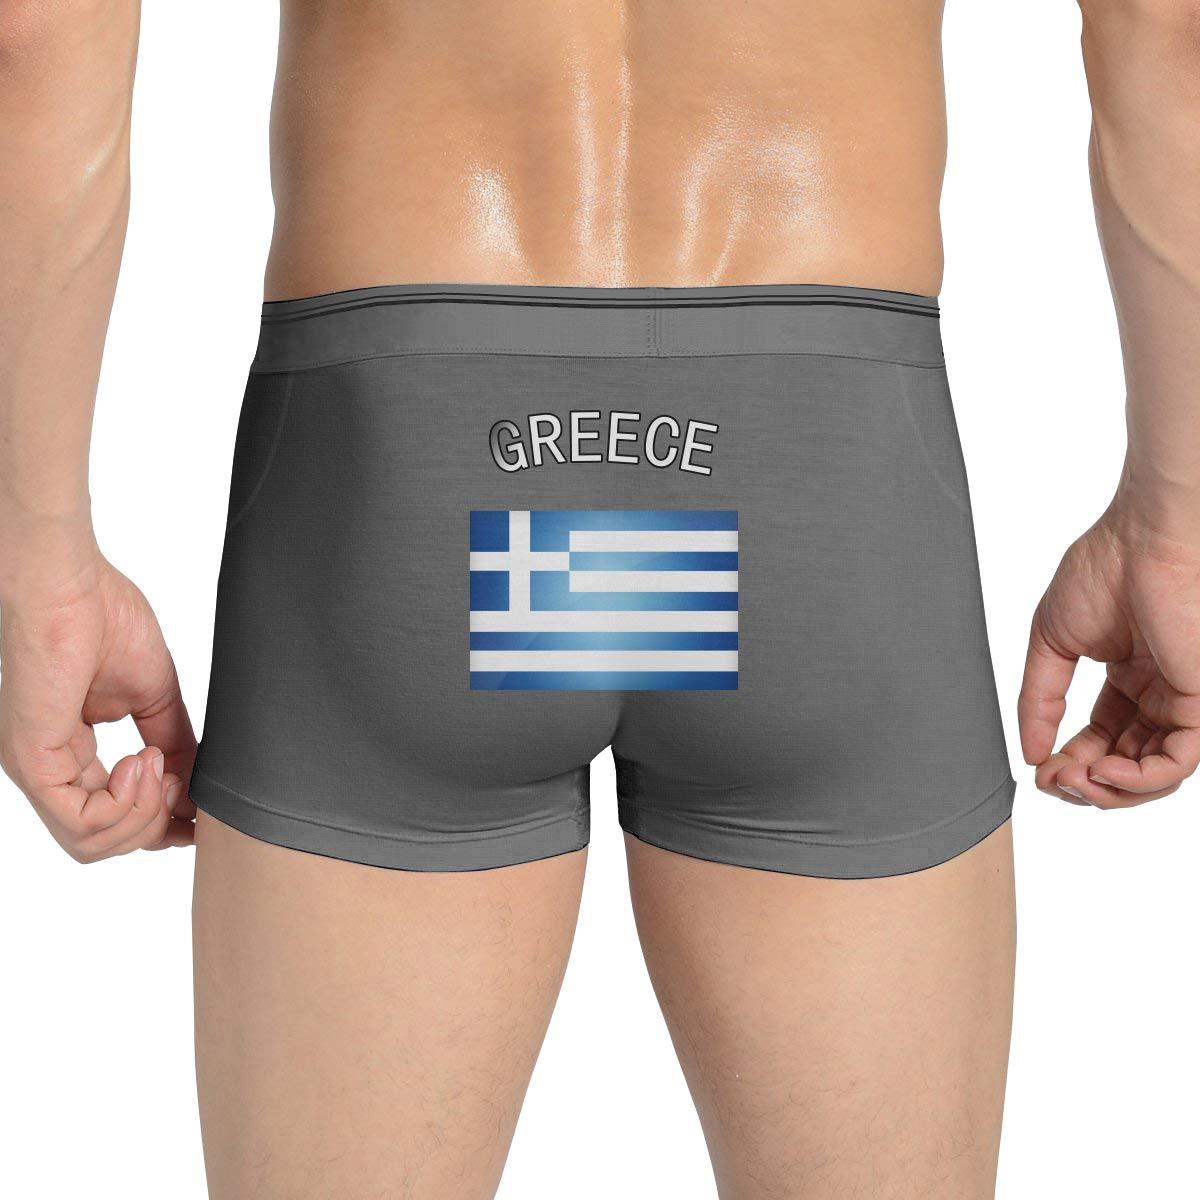 Greece Greek Flag Mens Underwear Funny Boxer Brief Breathable Bikini Briefs